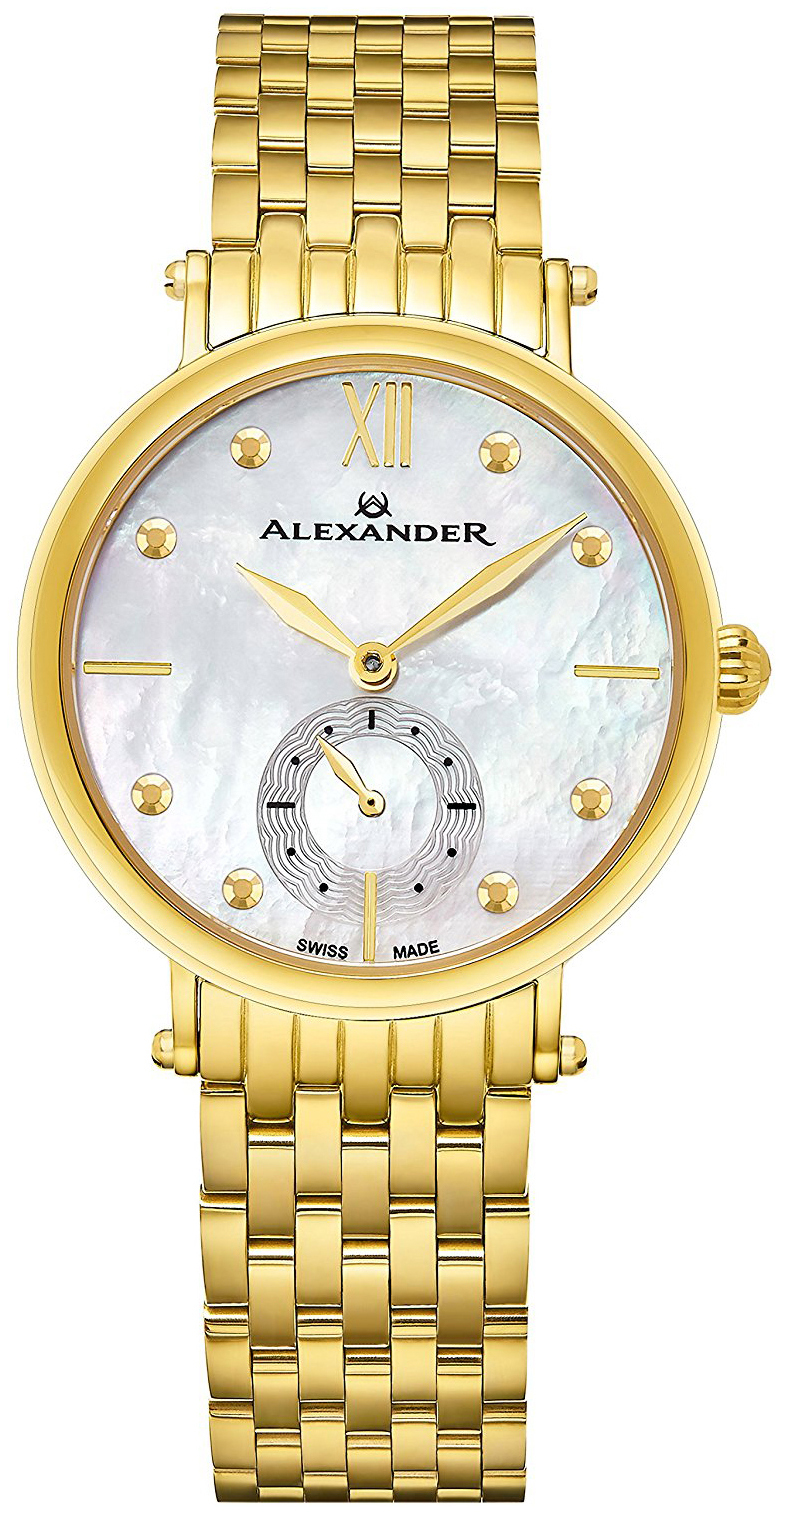 Alexander Monarch Damklocka A201B-02 Silverfärgad/Gulguldtonat stål Ø34 - Alexander